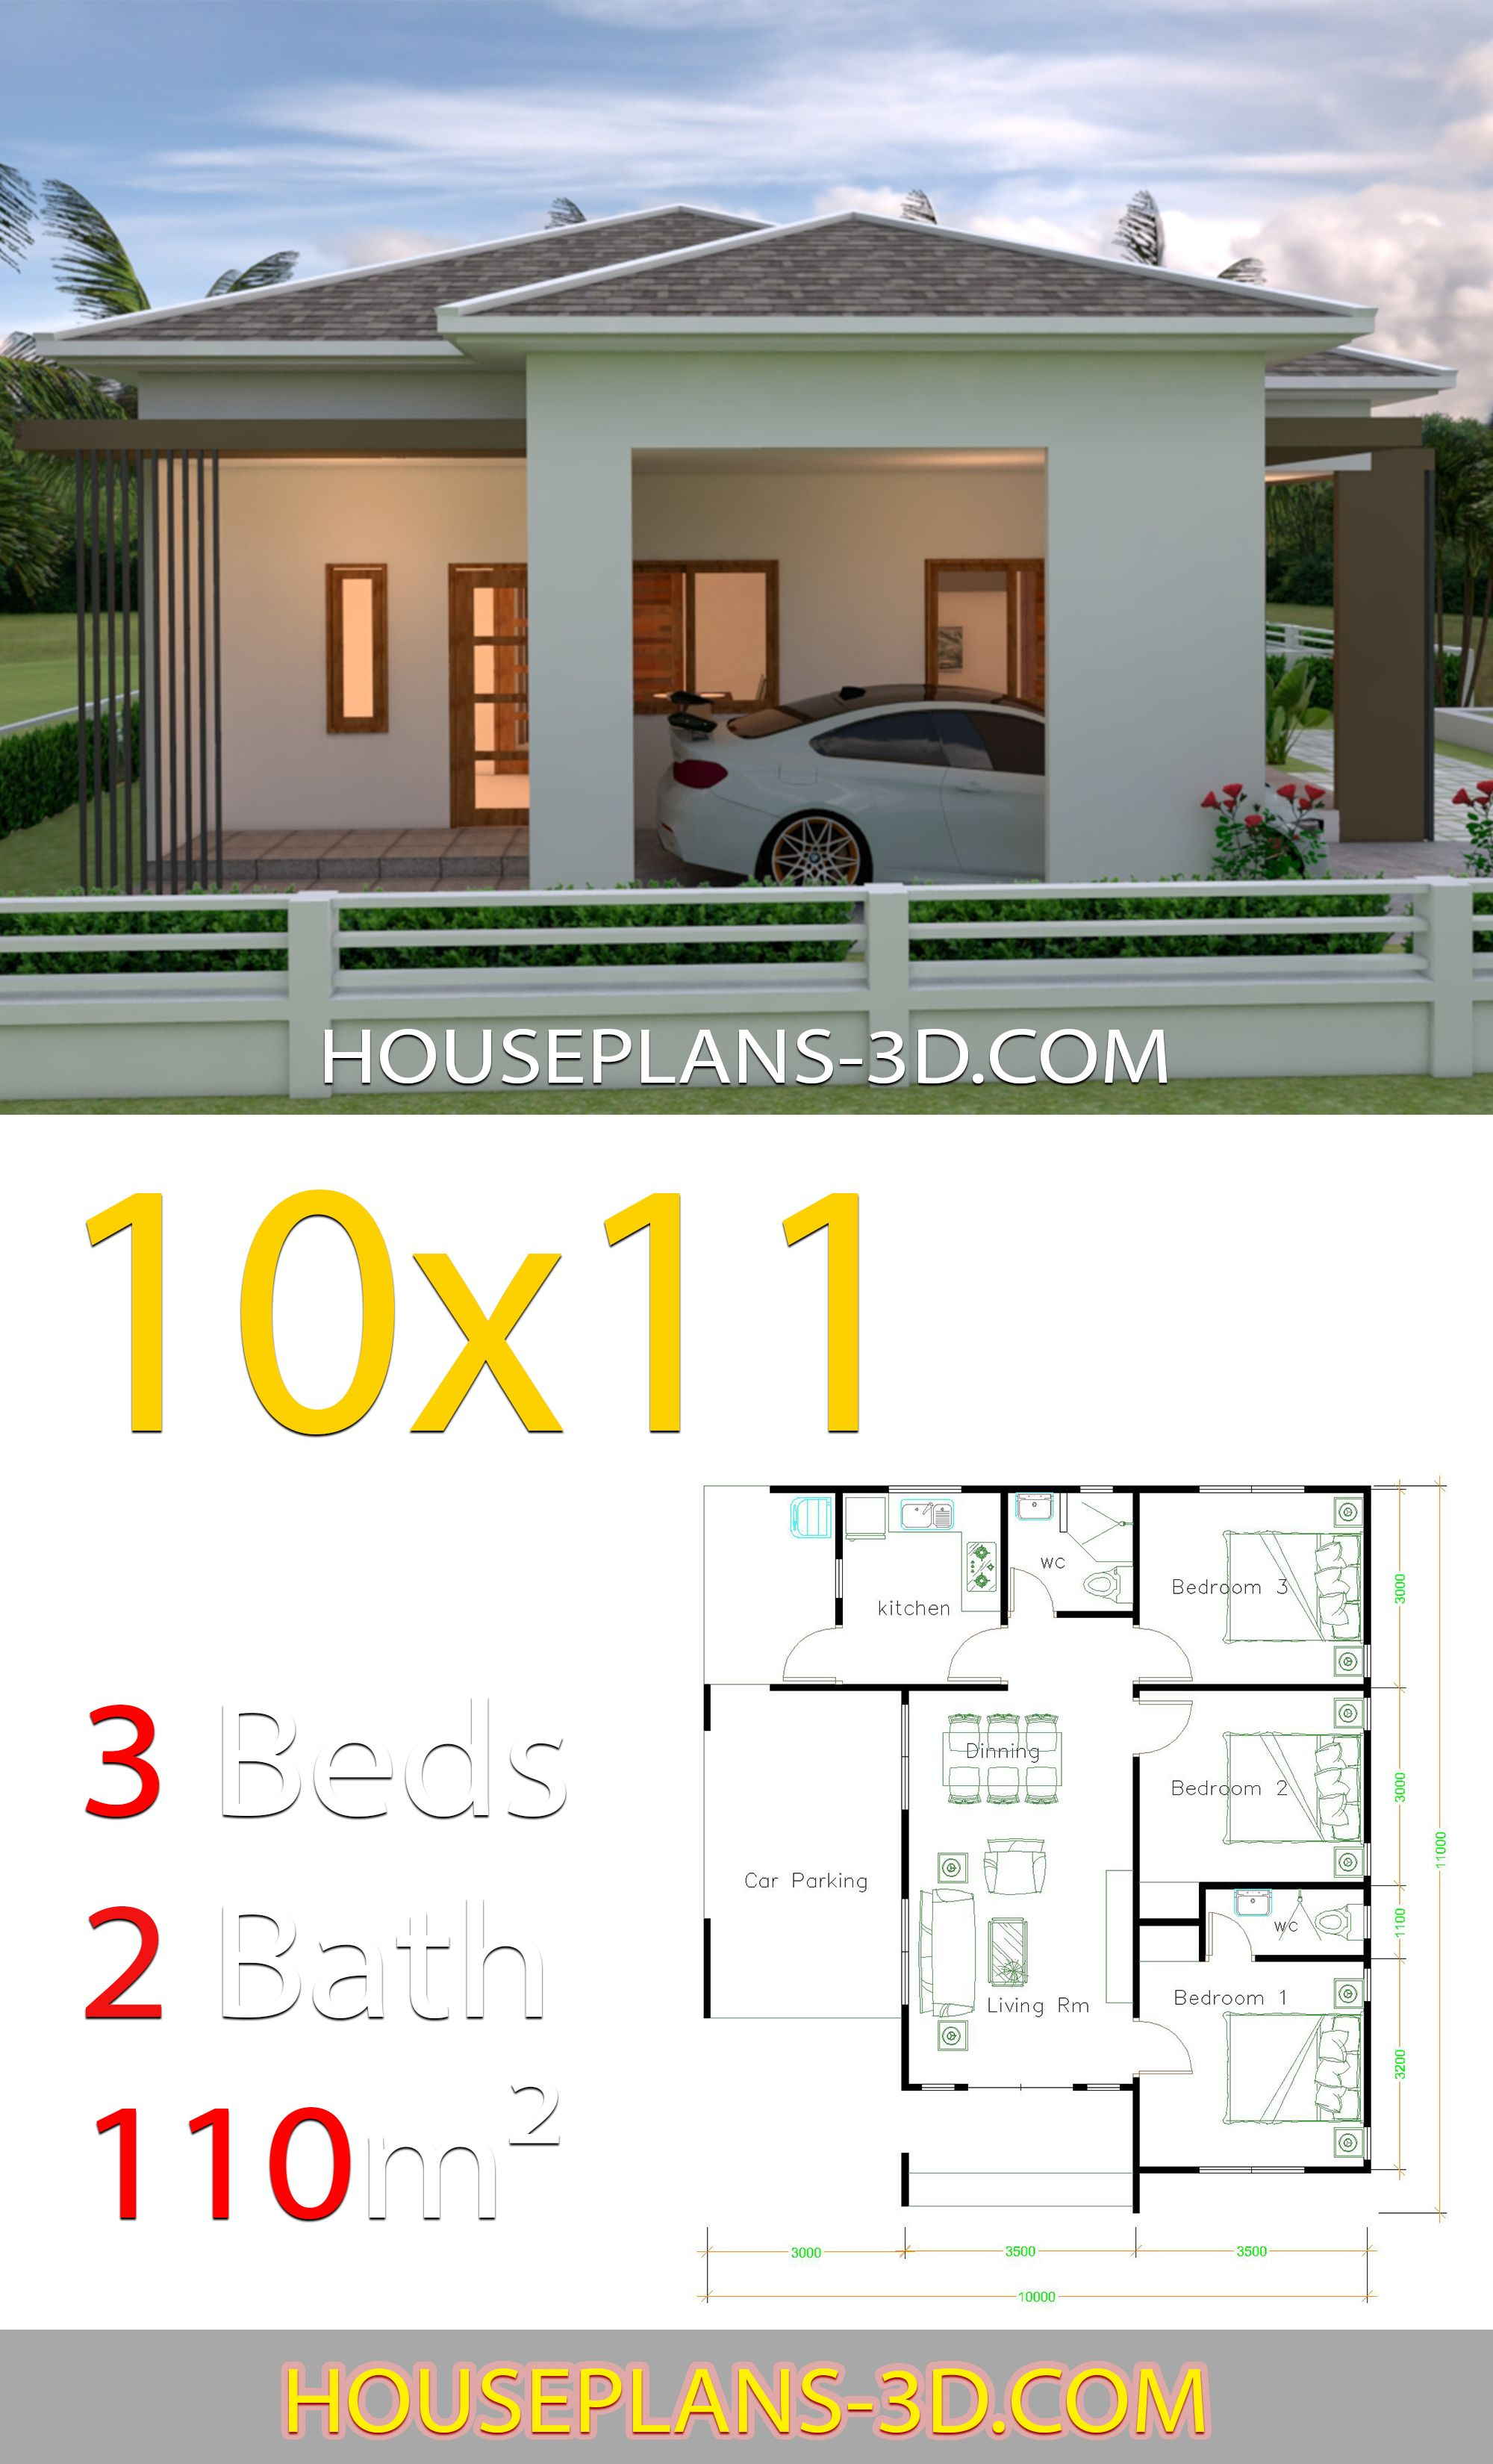 10x11 Bedroom : 10x11, bedroom, House, Design, Bedrooms, Tiles, Plans, Projetos, Casas, Simples,, Faxadas, Casas,, Arquitetura